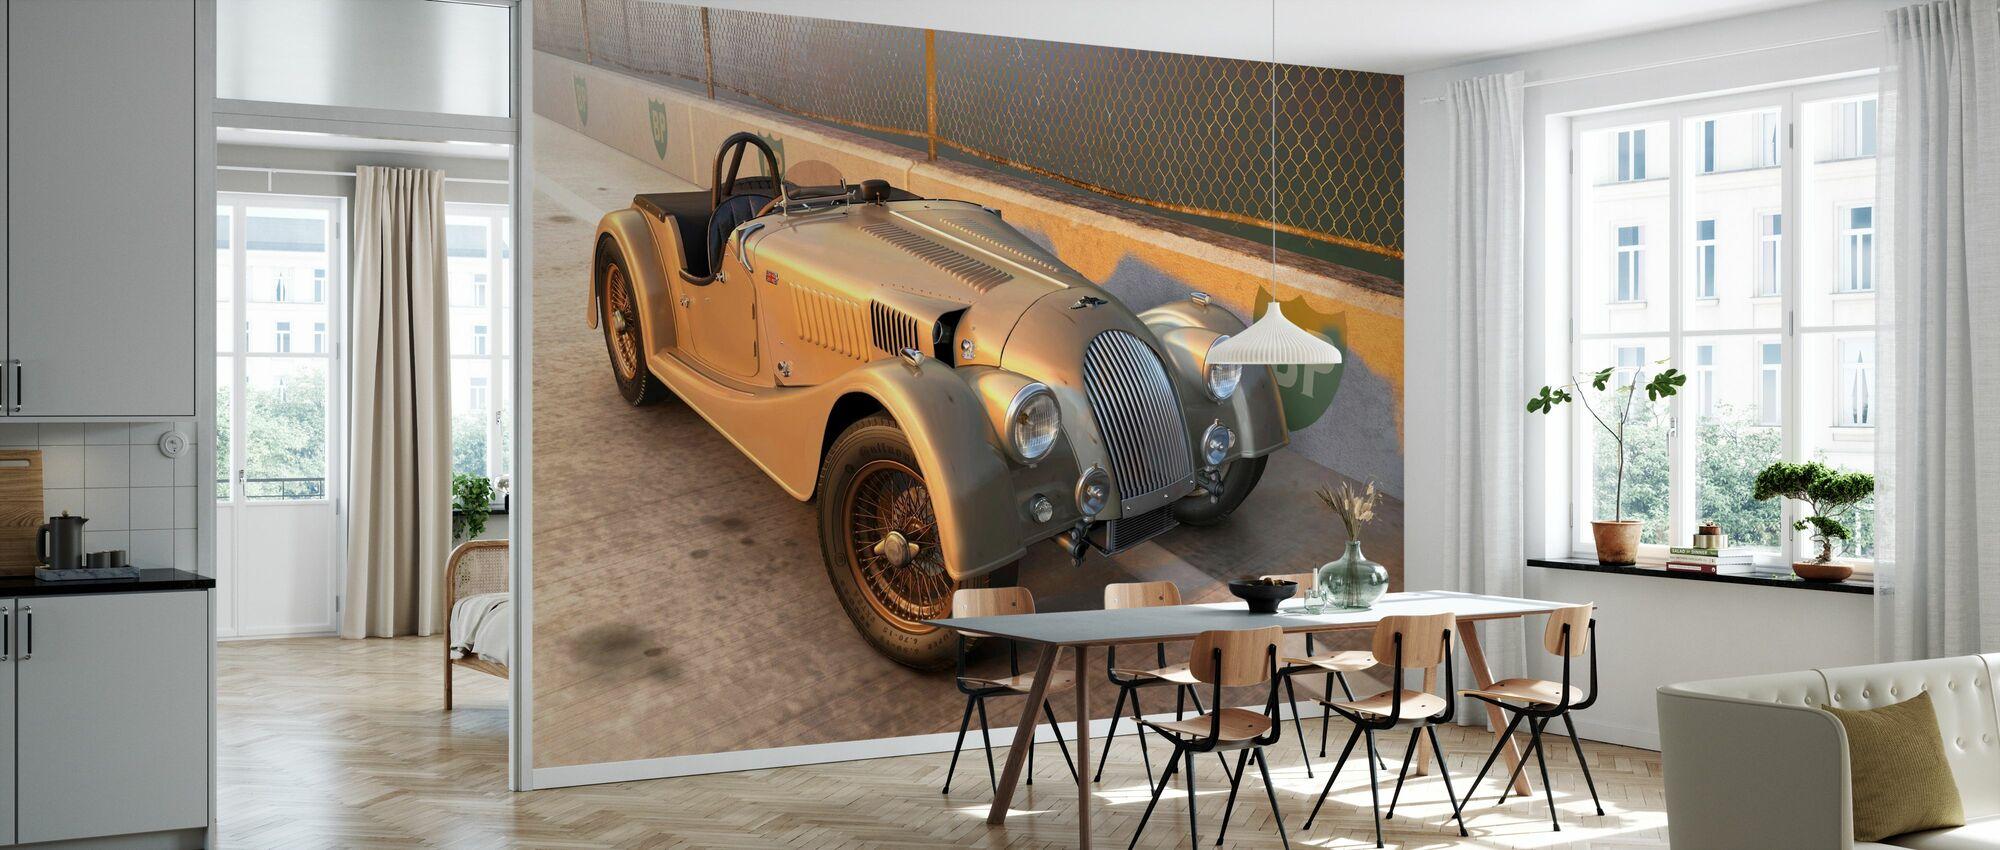 British Sports Car at the Track - Wallpaper - Kitchen